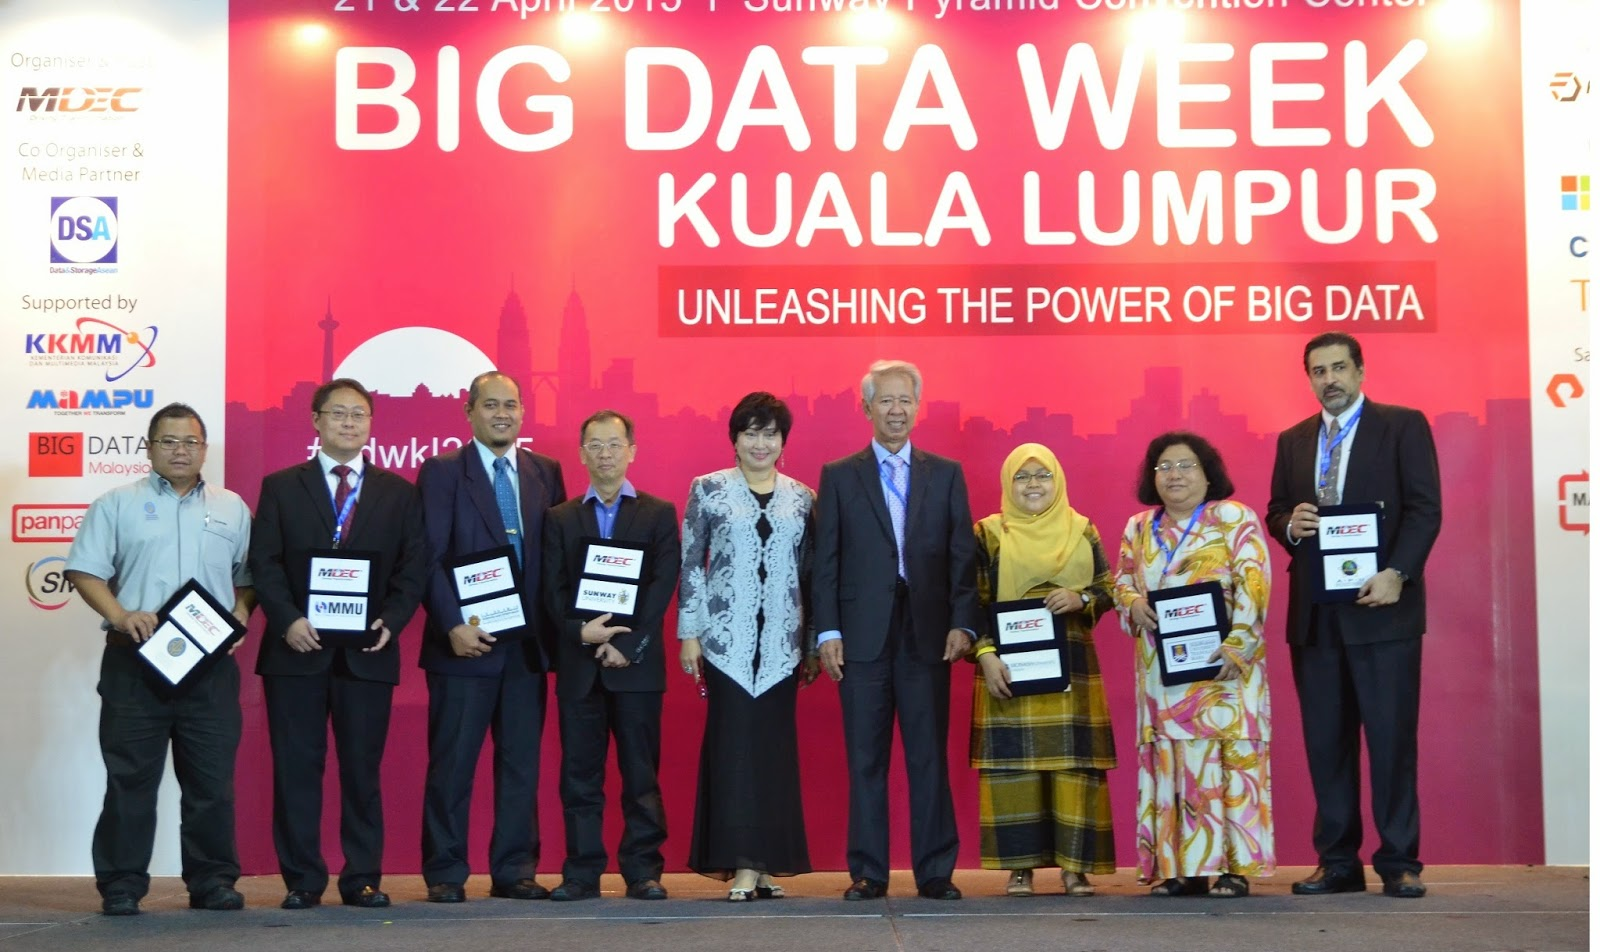 Big Data Week KL